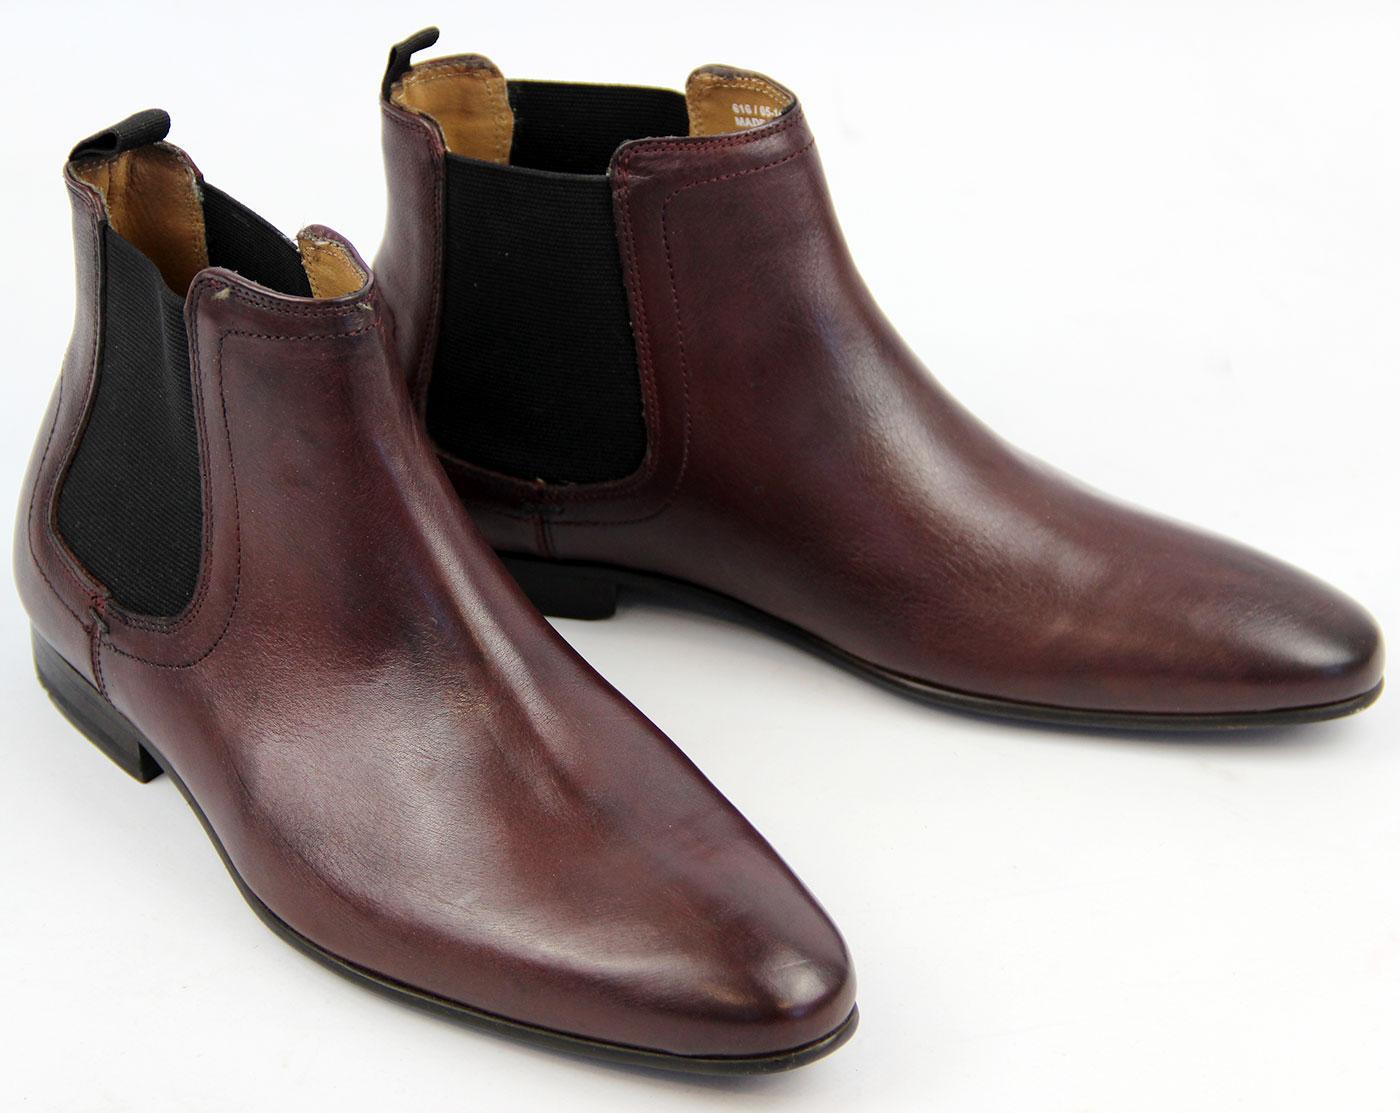 50e555caed9 Enox BEN SHERMAN Retro 60s Mod Chelsea Boots BURG